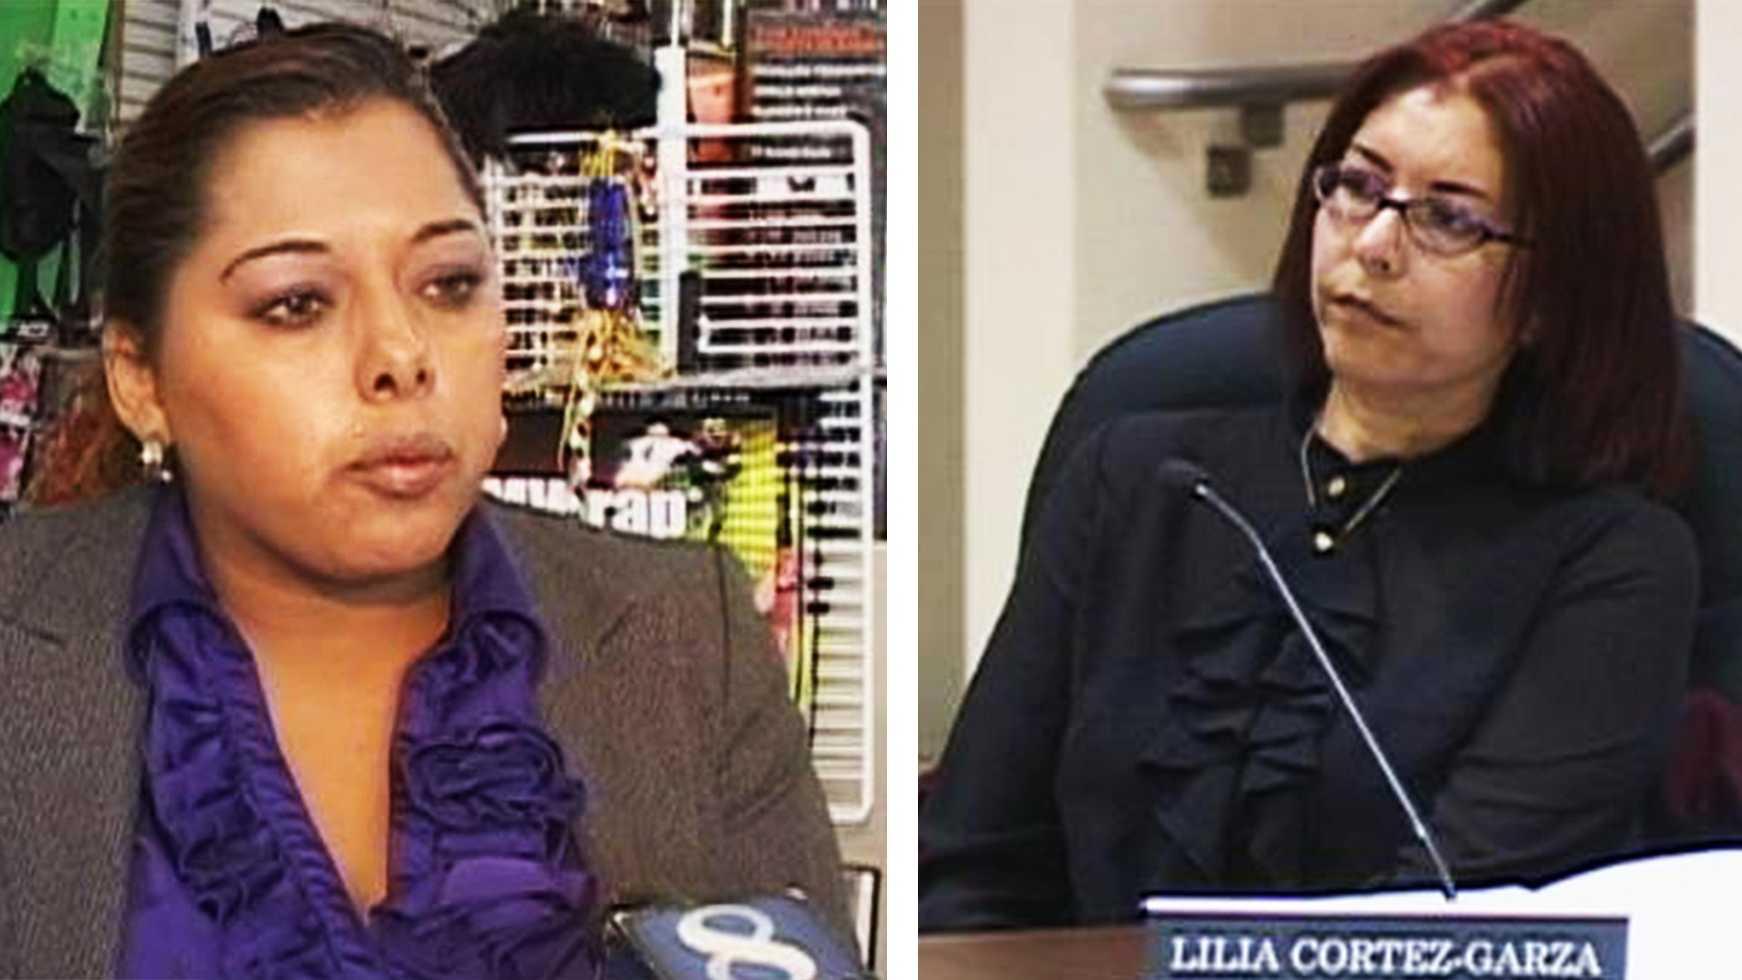 Maricela Cruz, left, is running against incumbent Lilia Cortez-Garza, right, for the Area 2 school board seat.